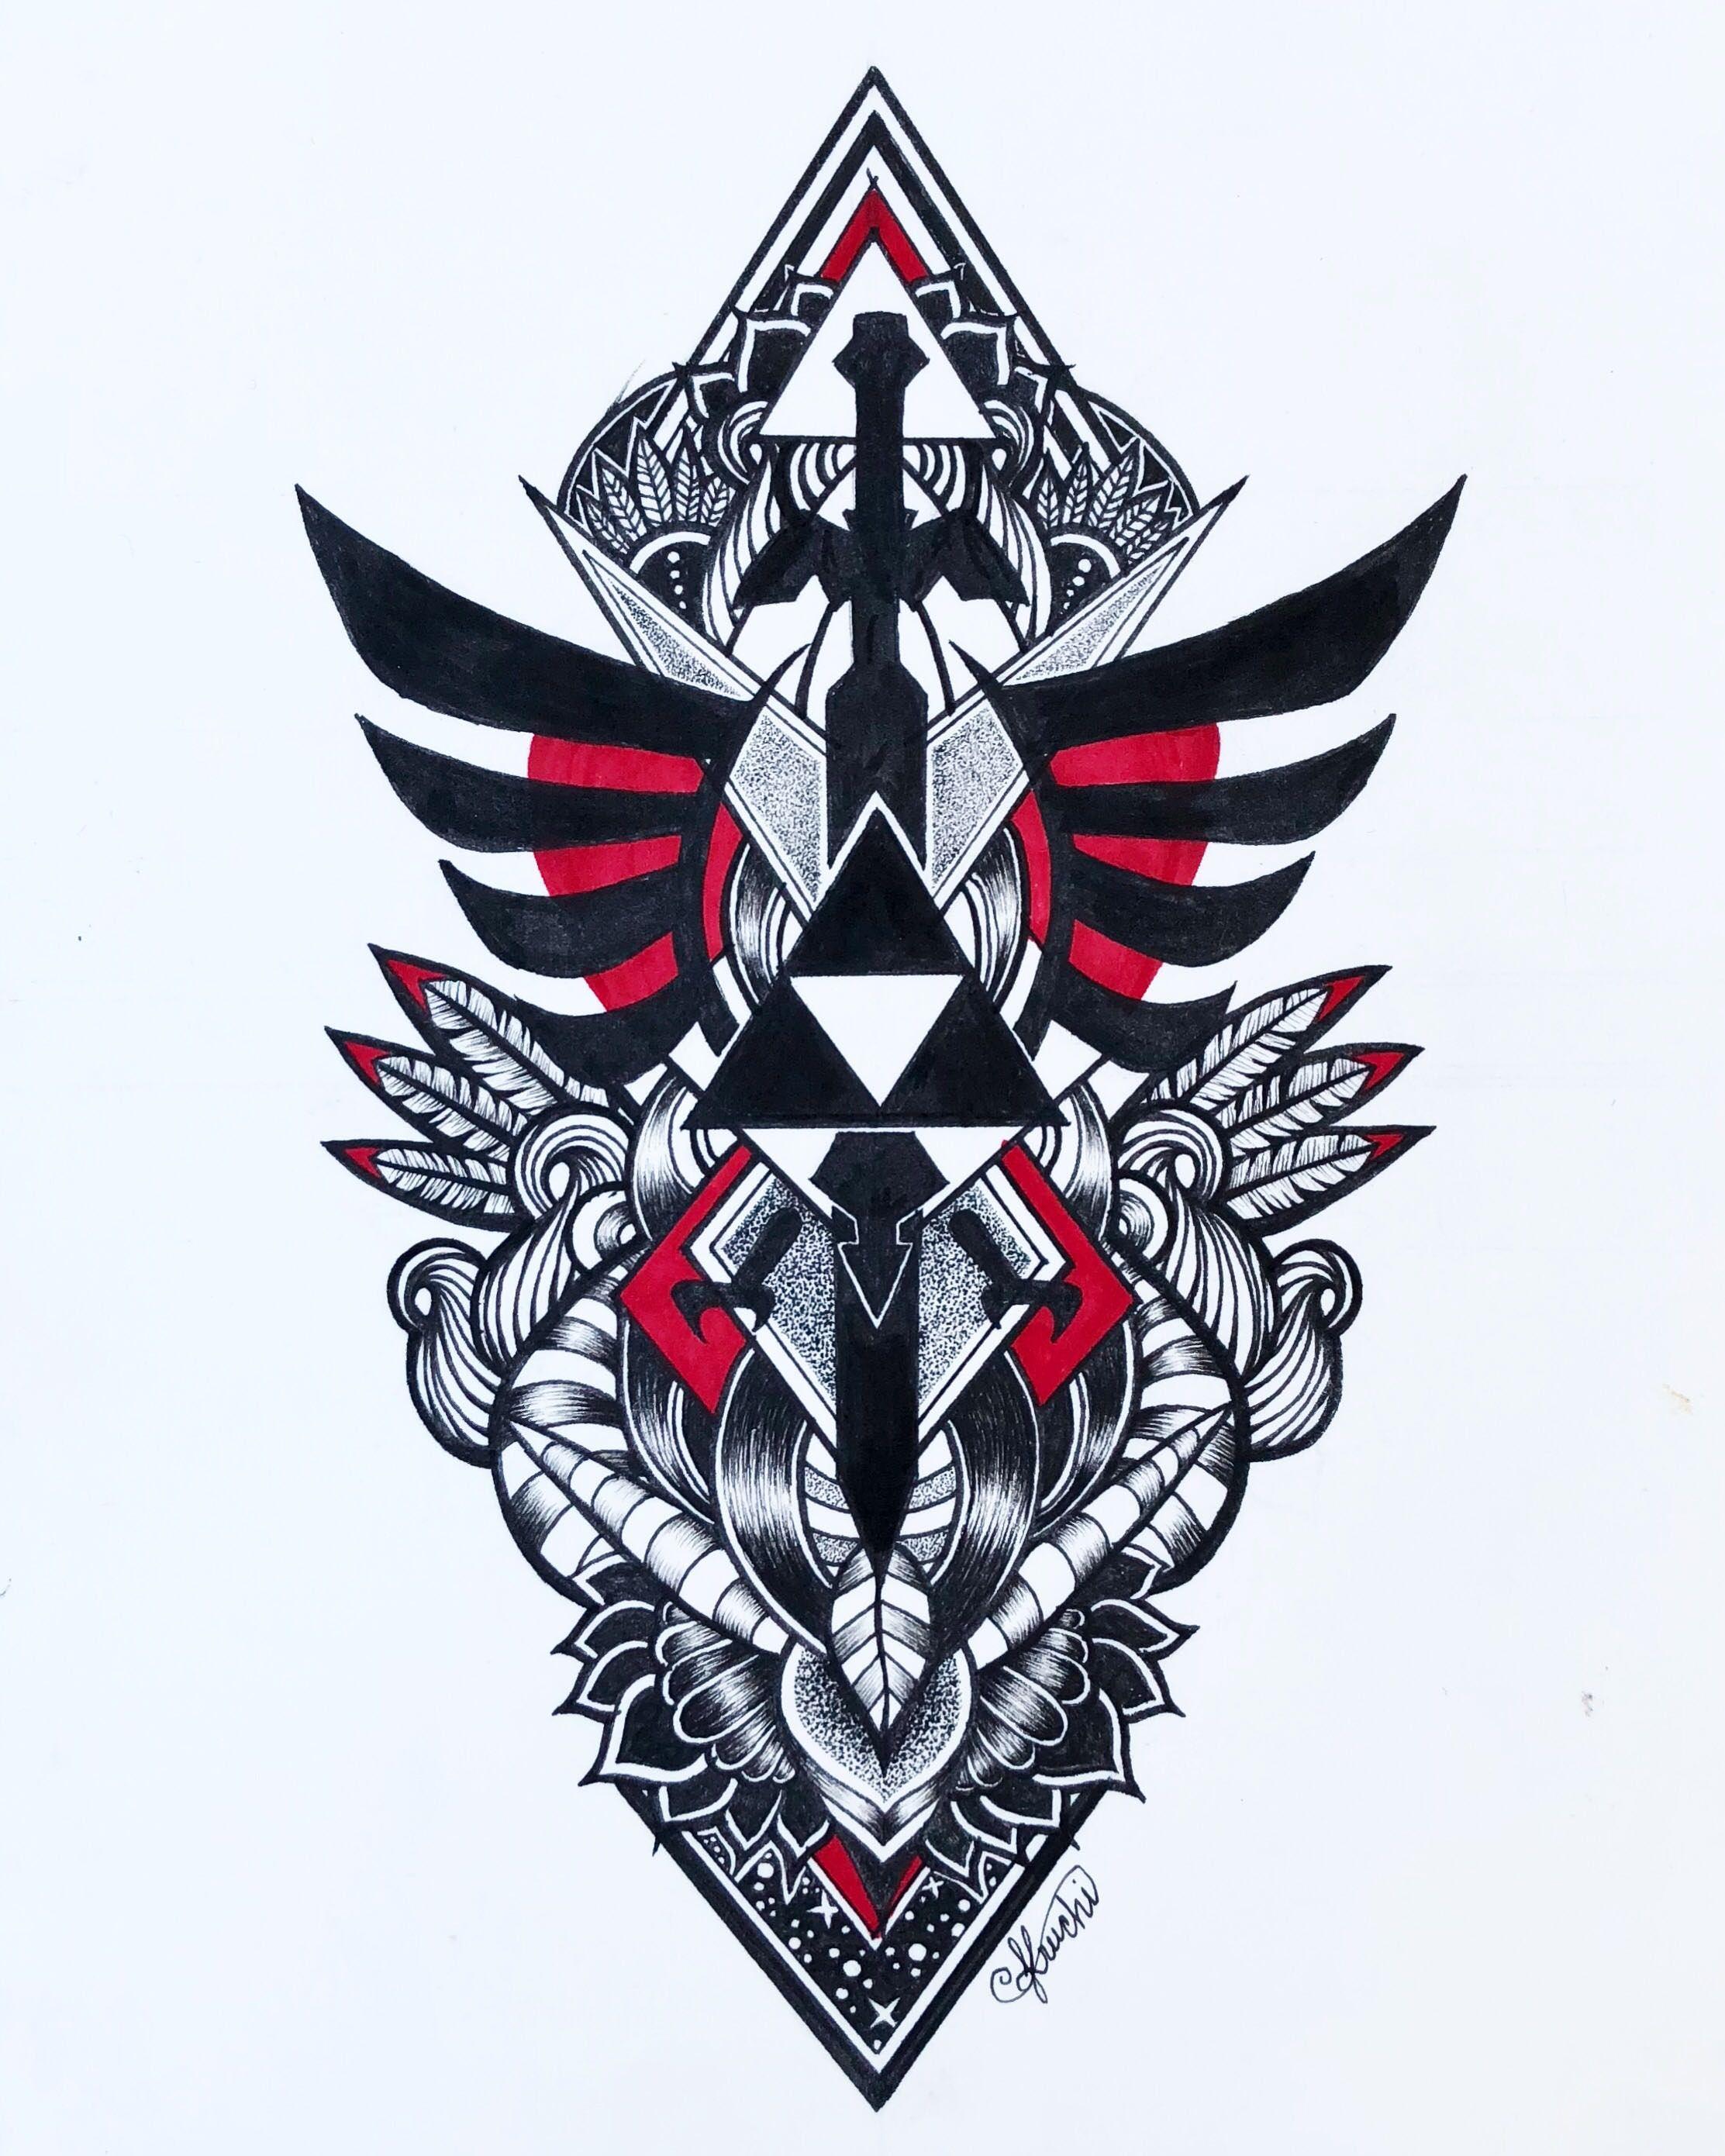 MM ideas Legend of zelda tattoos, Zelda tattoo, Zelda logo